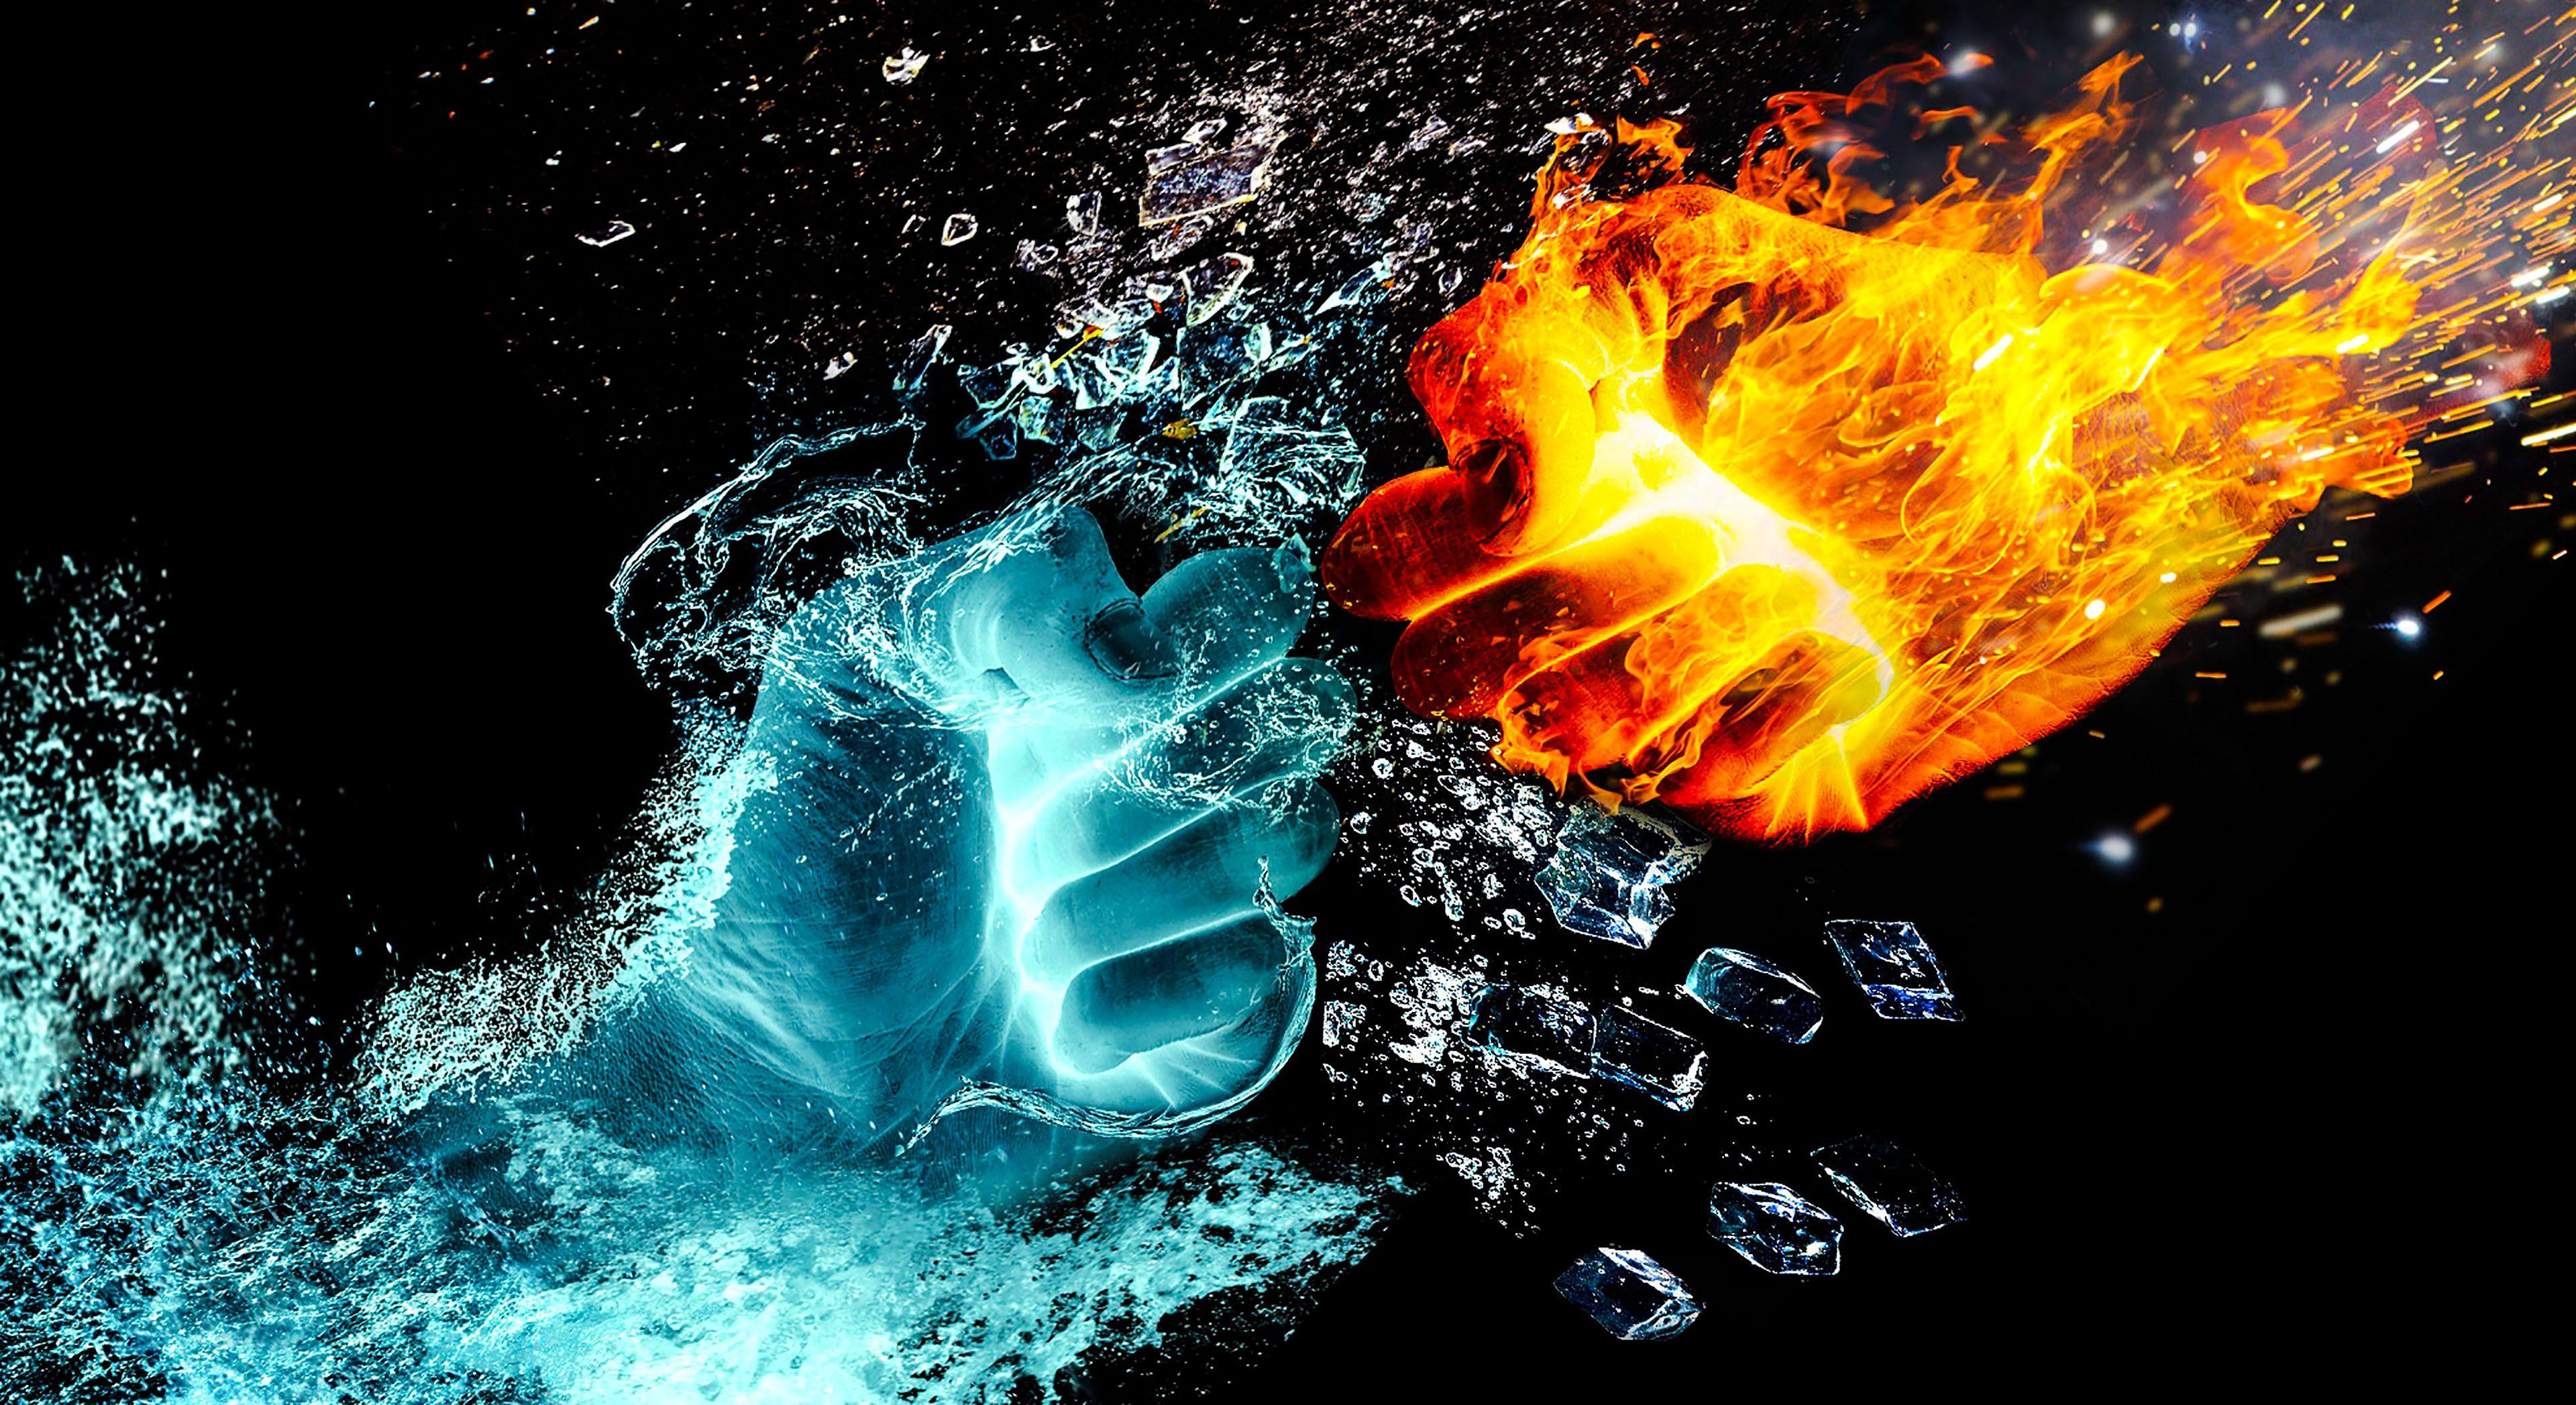 Fire Water Sparkle Ice Fantasy 4K Wallpaper - Best Wallpapers